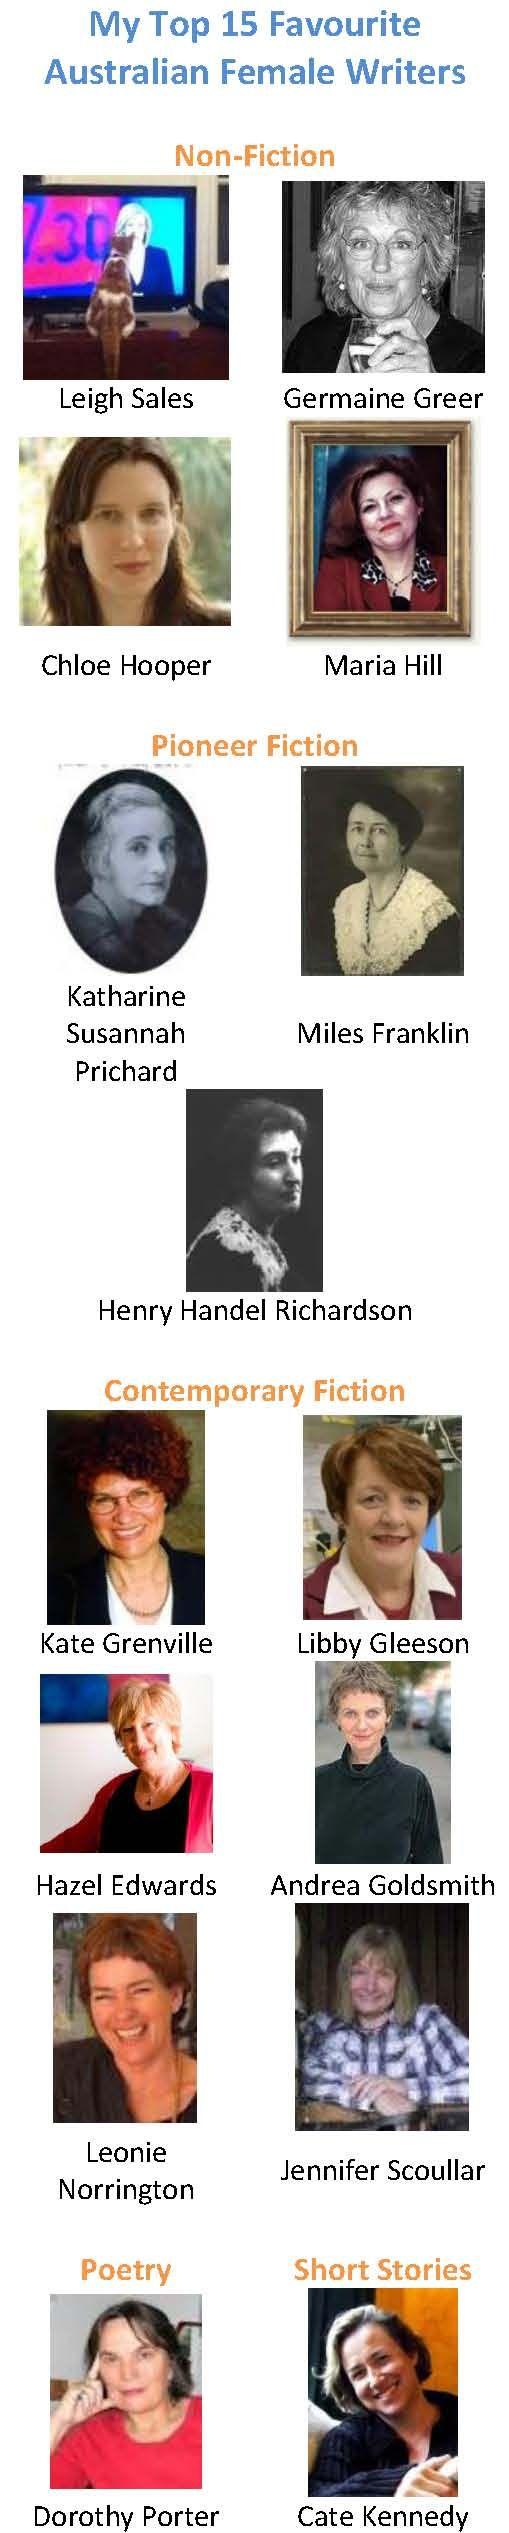 My Top 15 Favourite Australian Female Writers